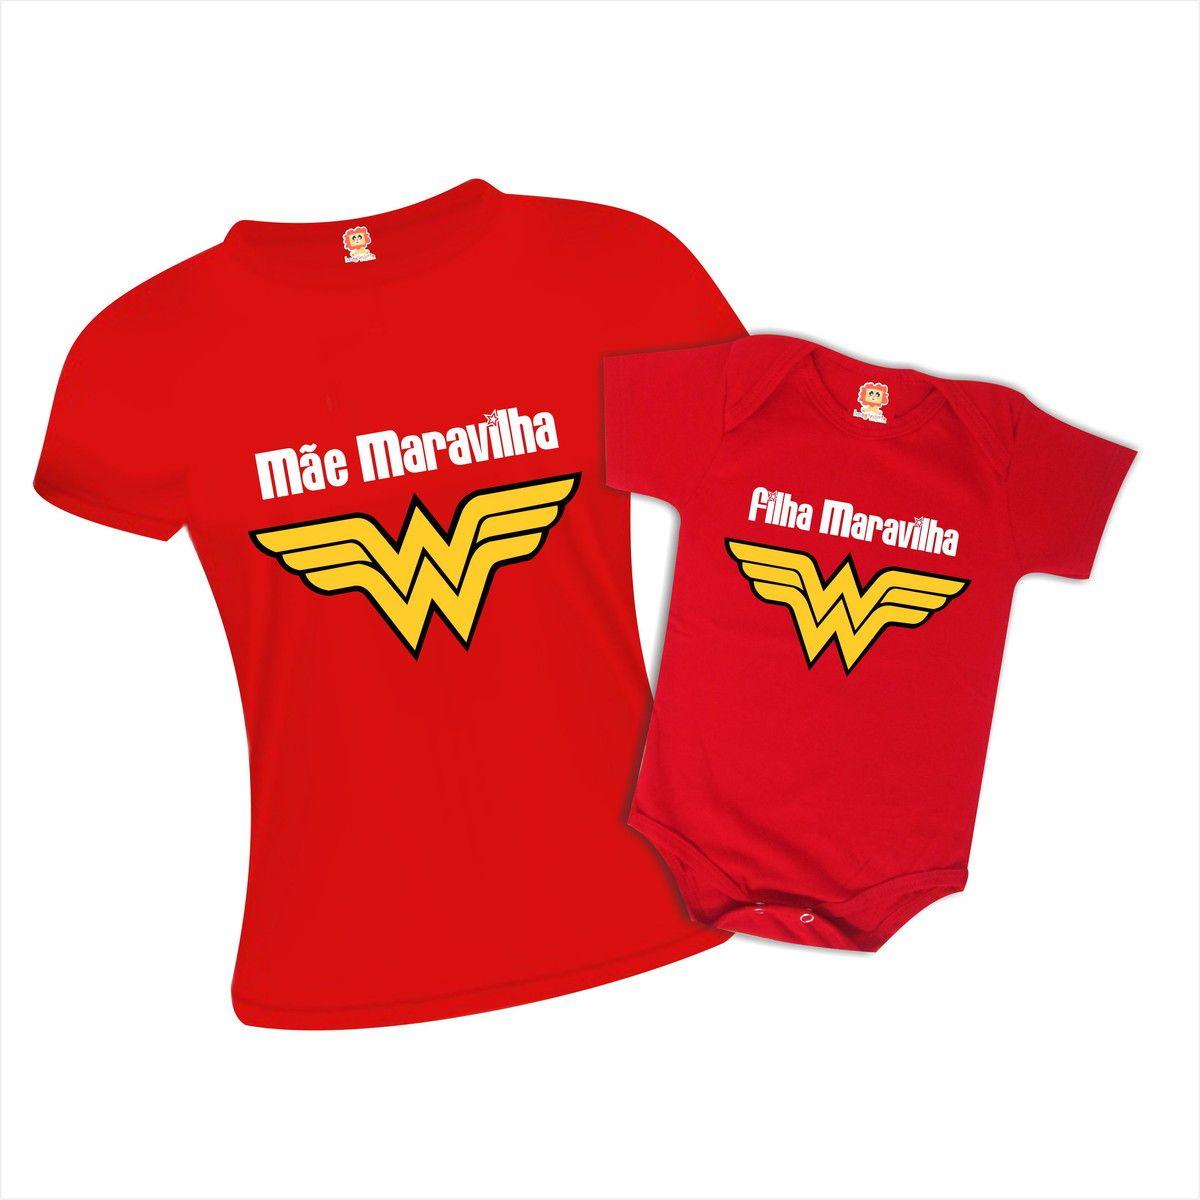 Kit Camiseta e Body Mãe e Filha Maravilha